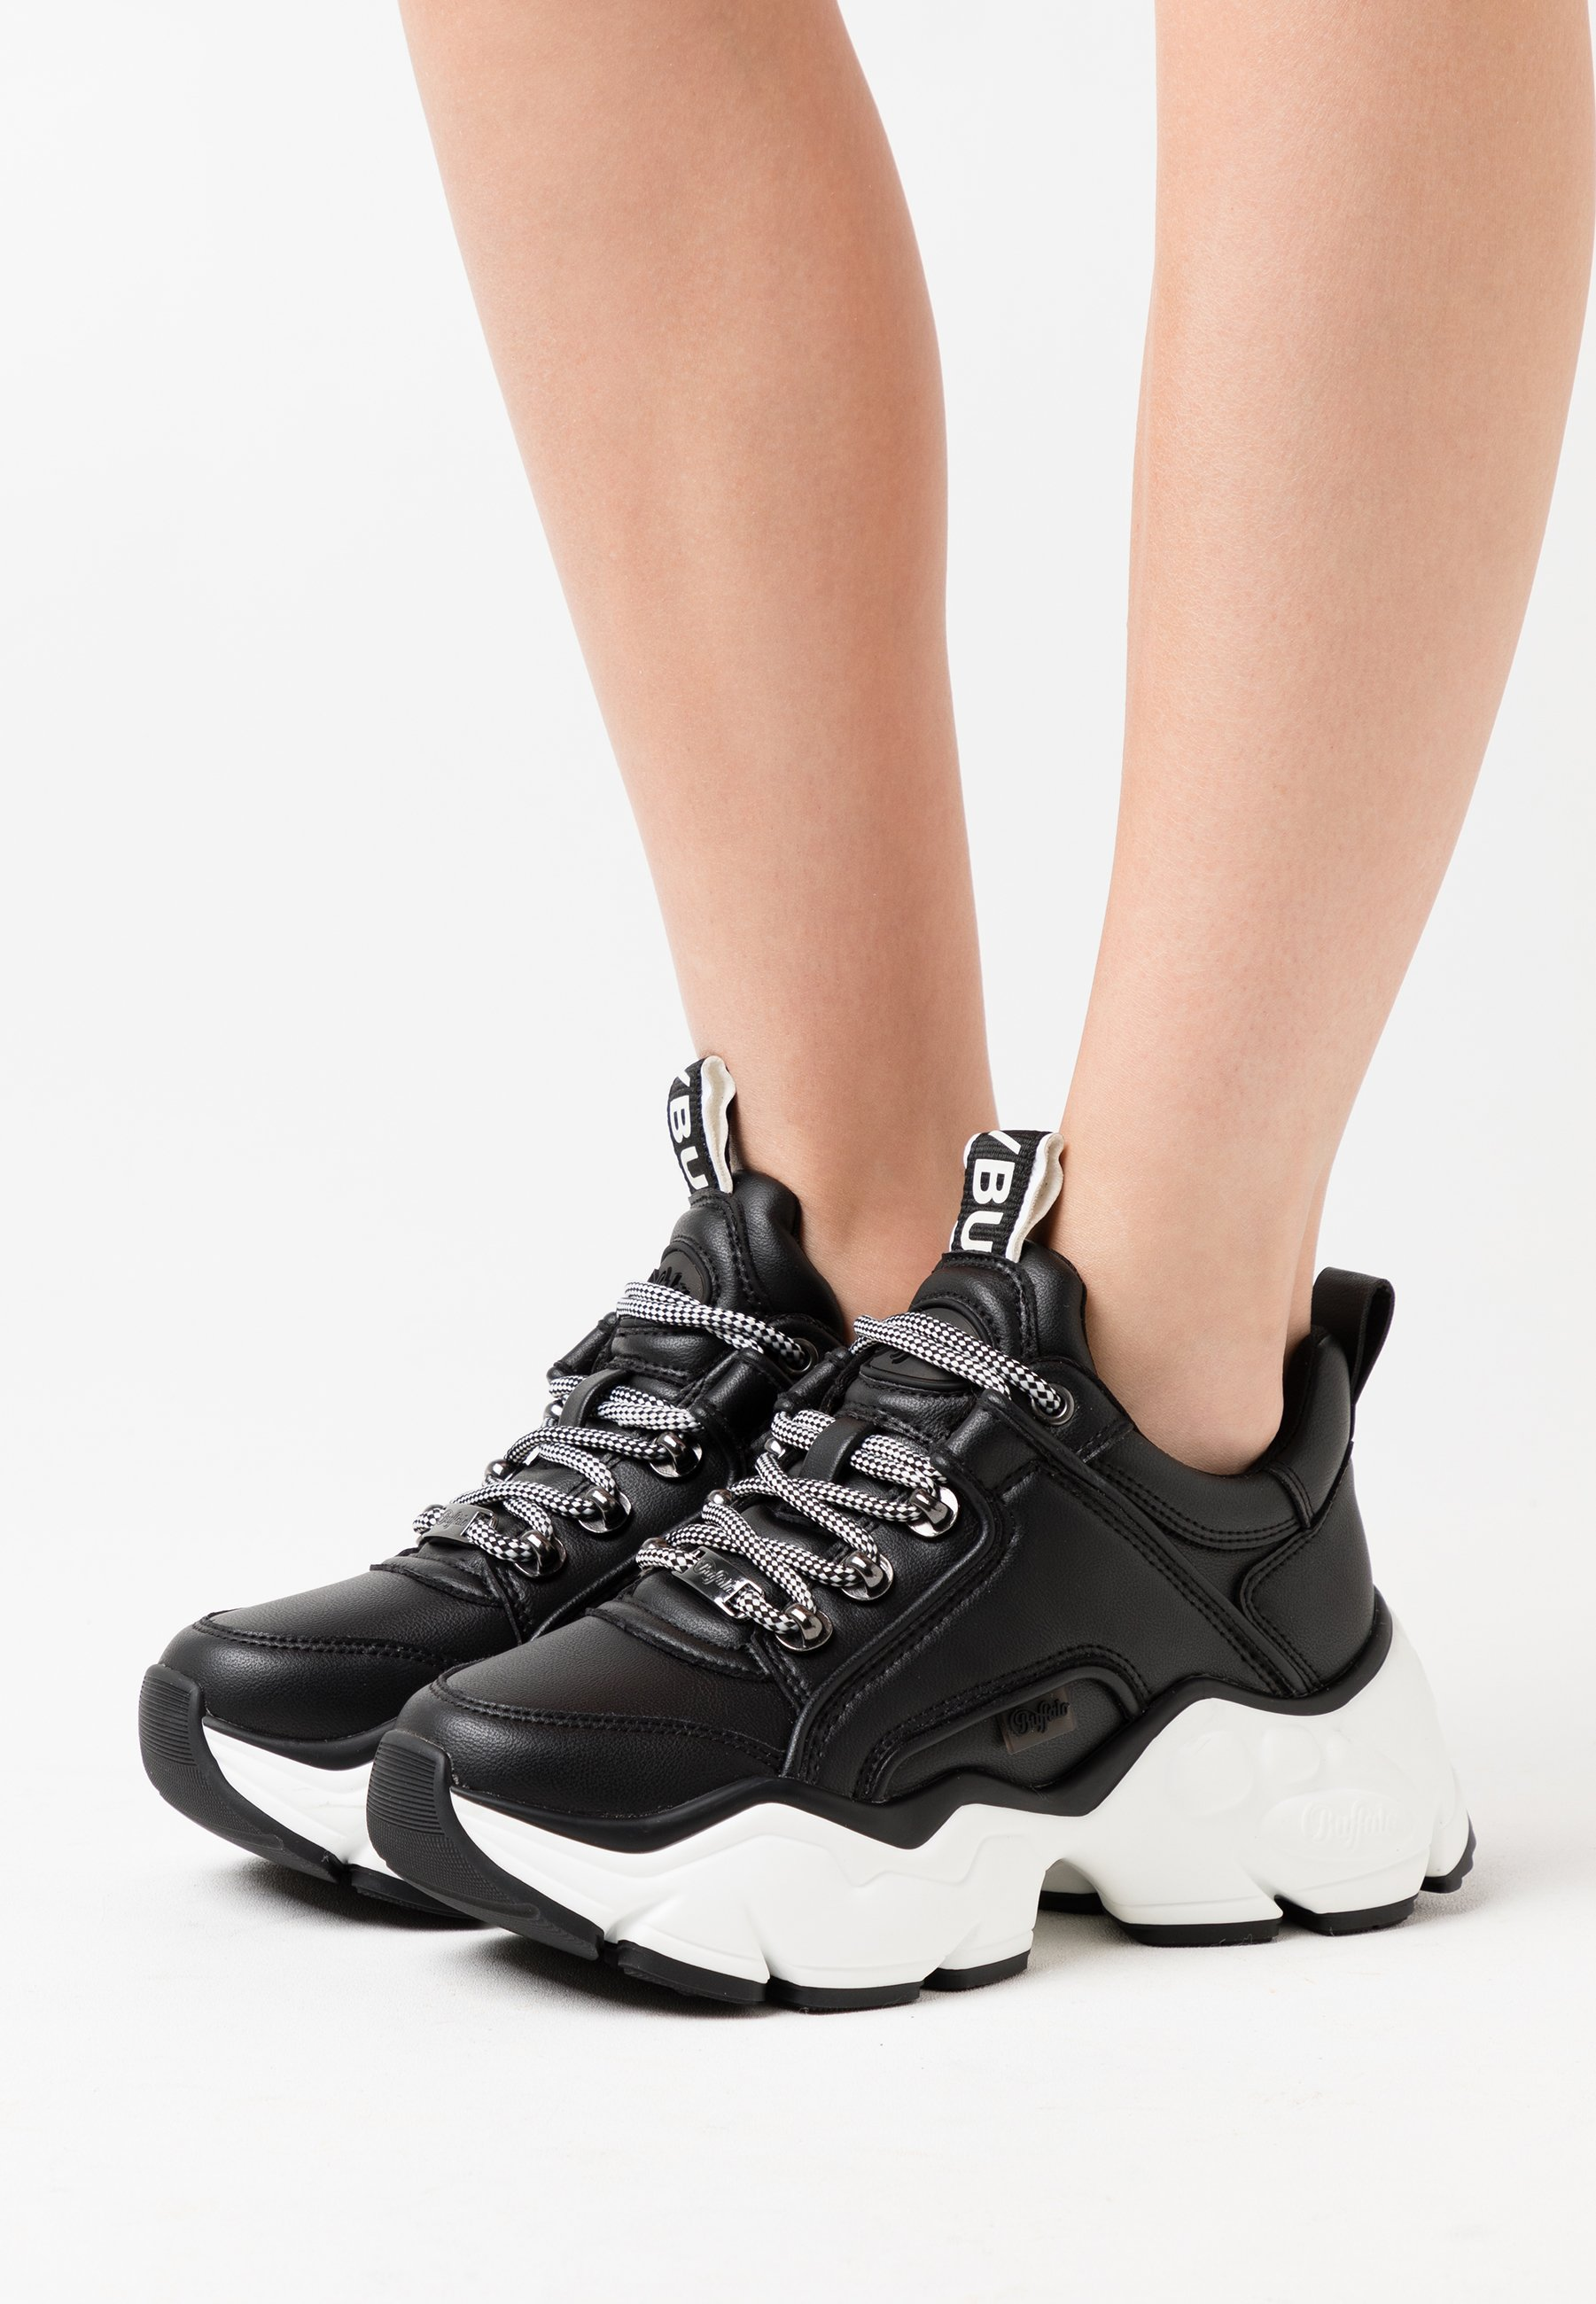 Nuovo stile Scarpe da Donna Buffalo BINARY CASH Sneakers basse black